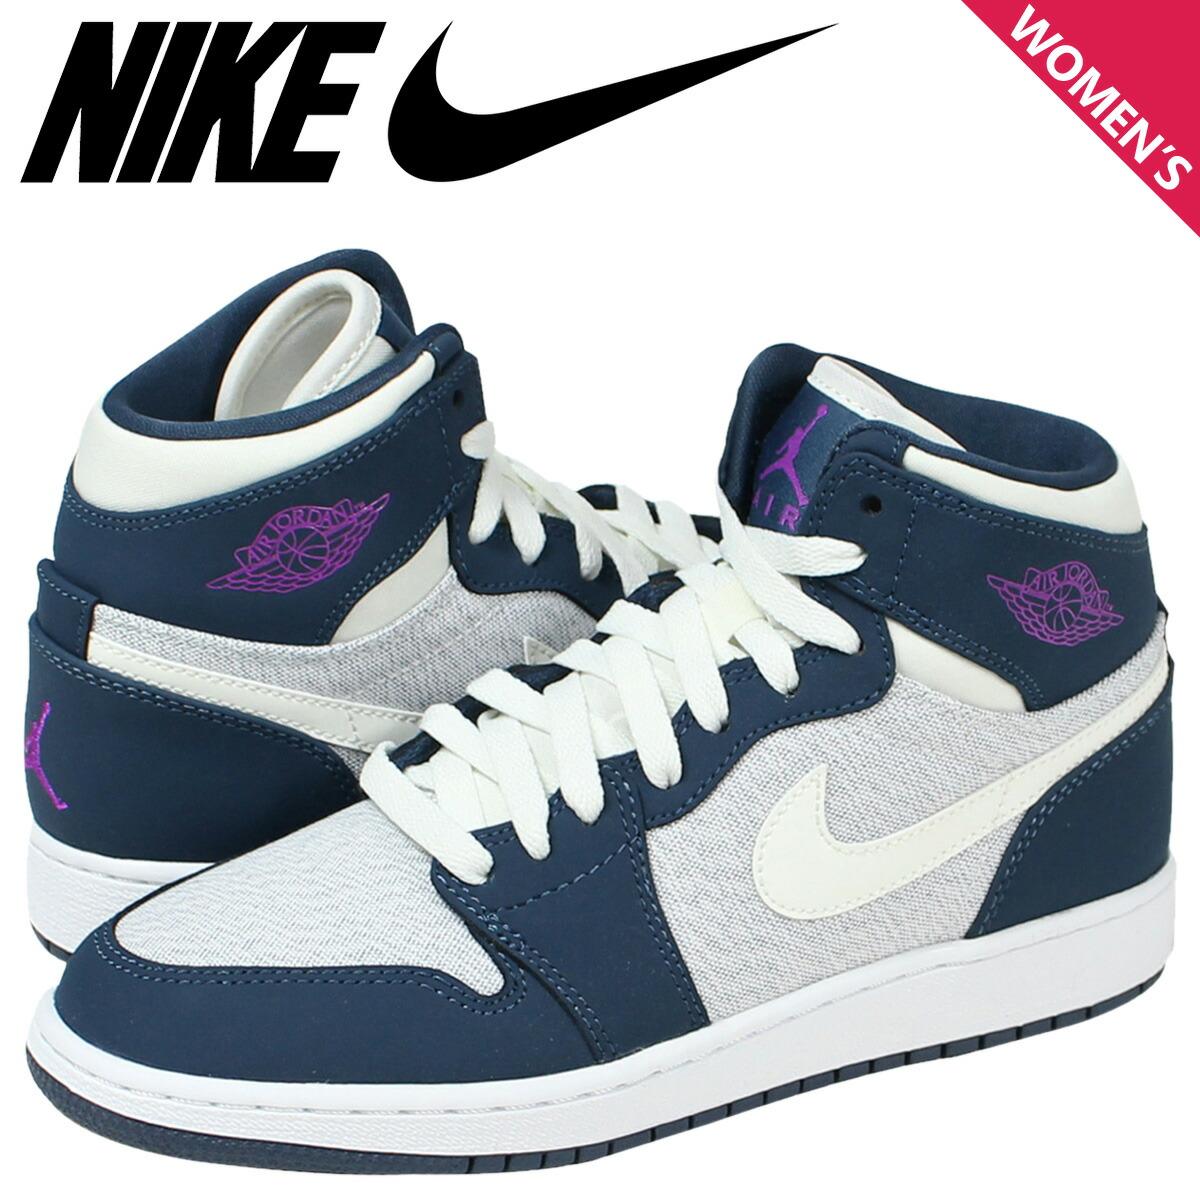 nike fers avis - Whats up Sports | Rakuten Global Market: NIKE Nike Air Jordan ...